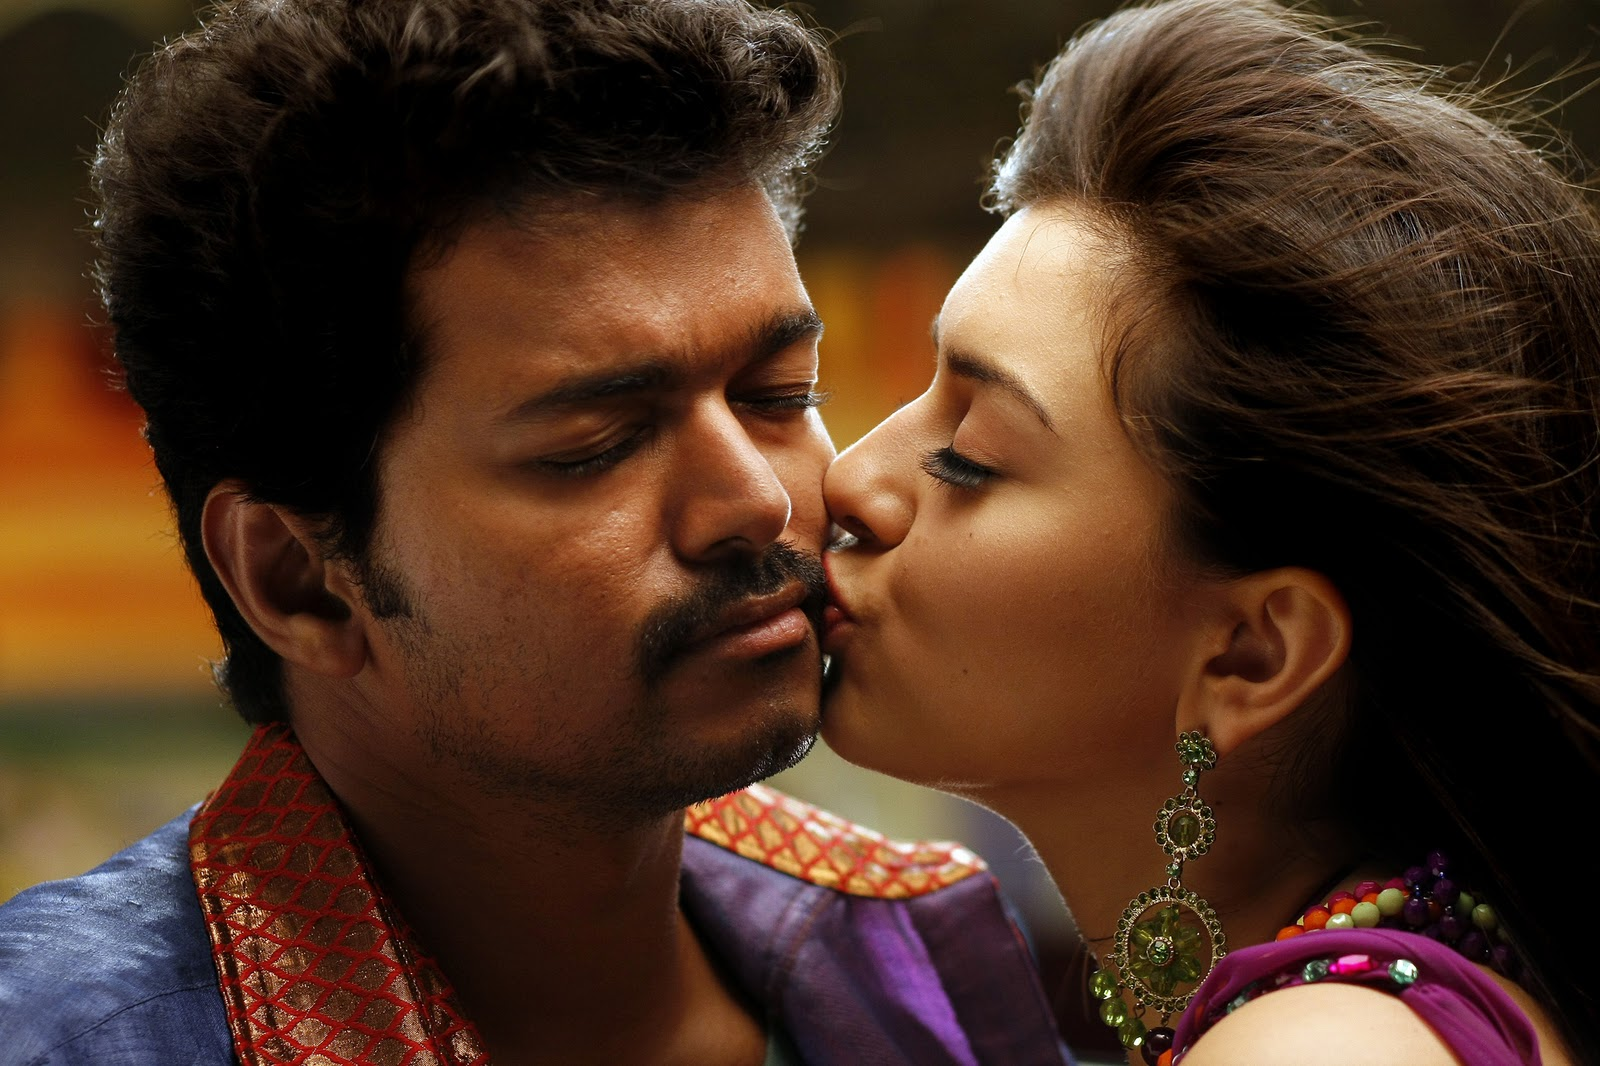 Hits of mallu romance videos hot indian masala videos bgrade movies - 5 5